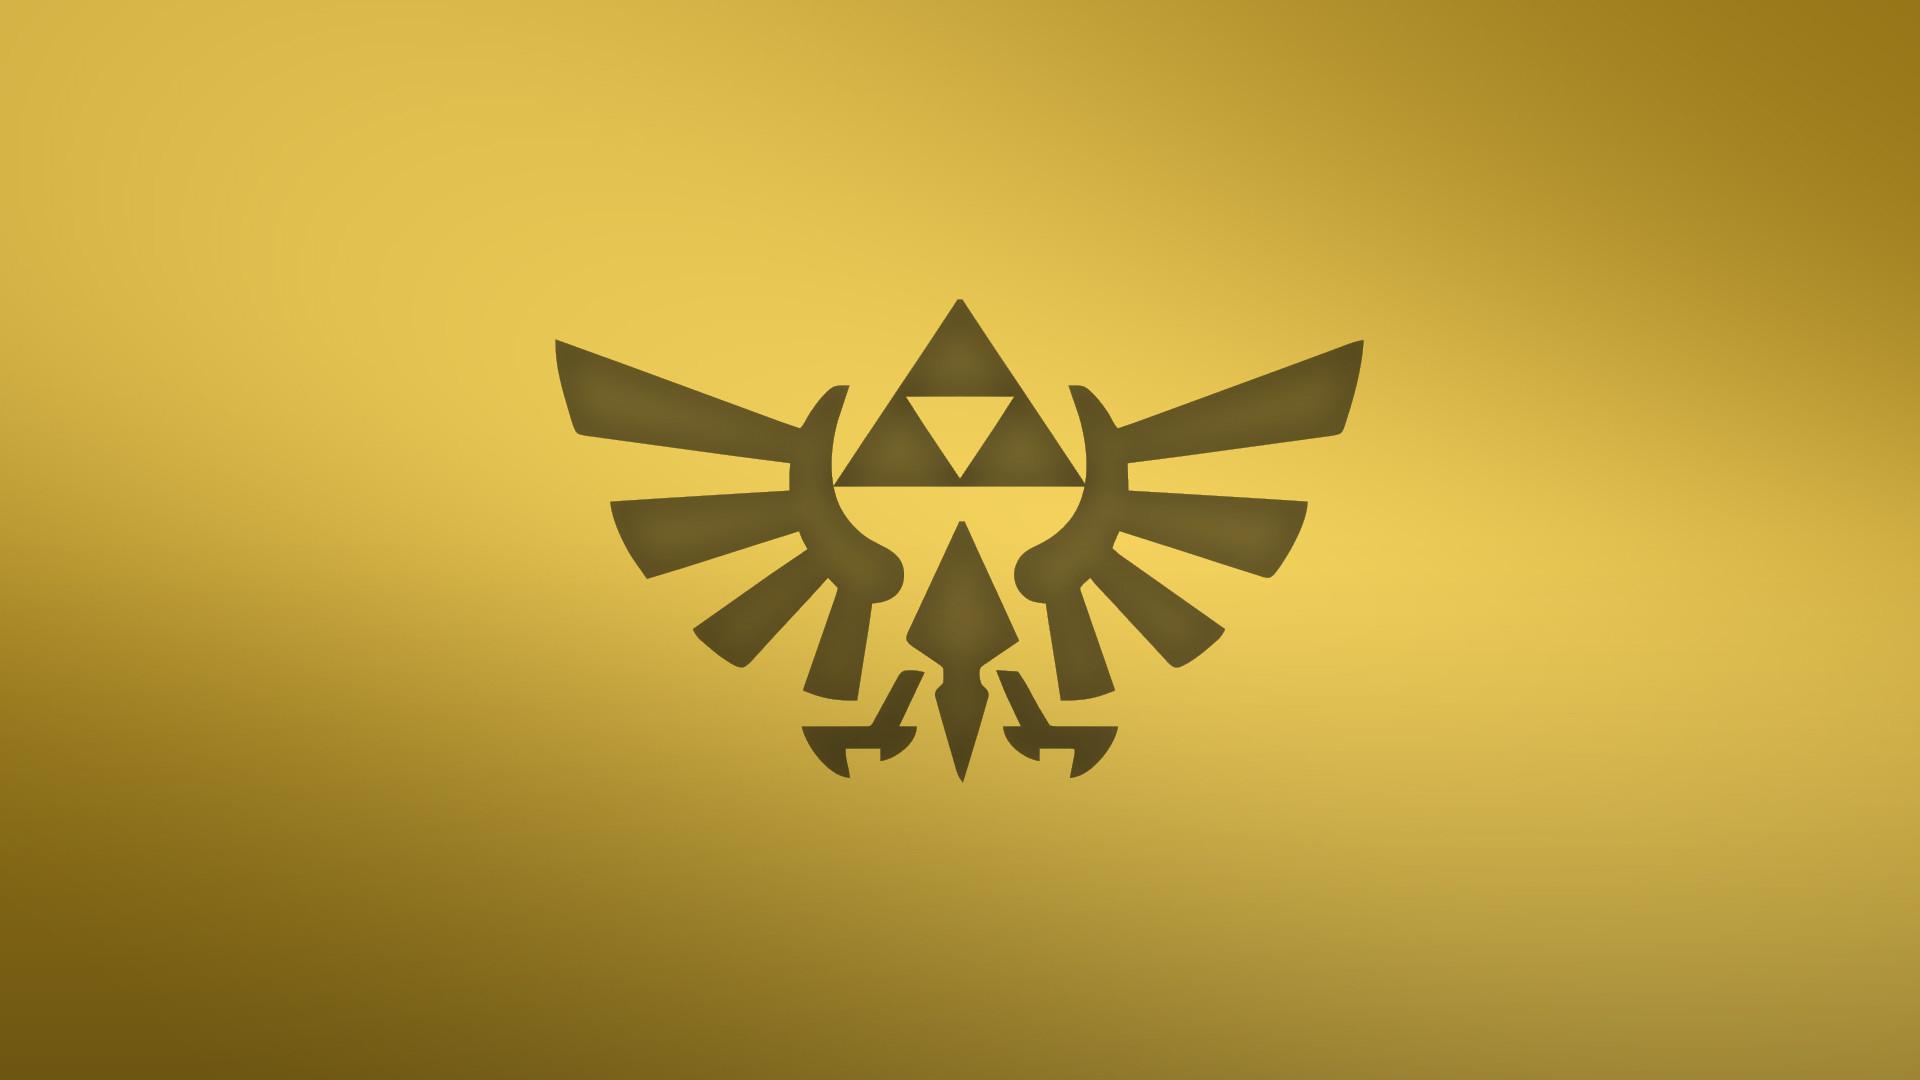 Gold Triforce Wallpaper by Cheetashock on DeviantArt